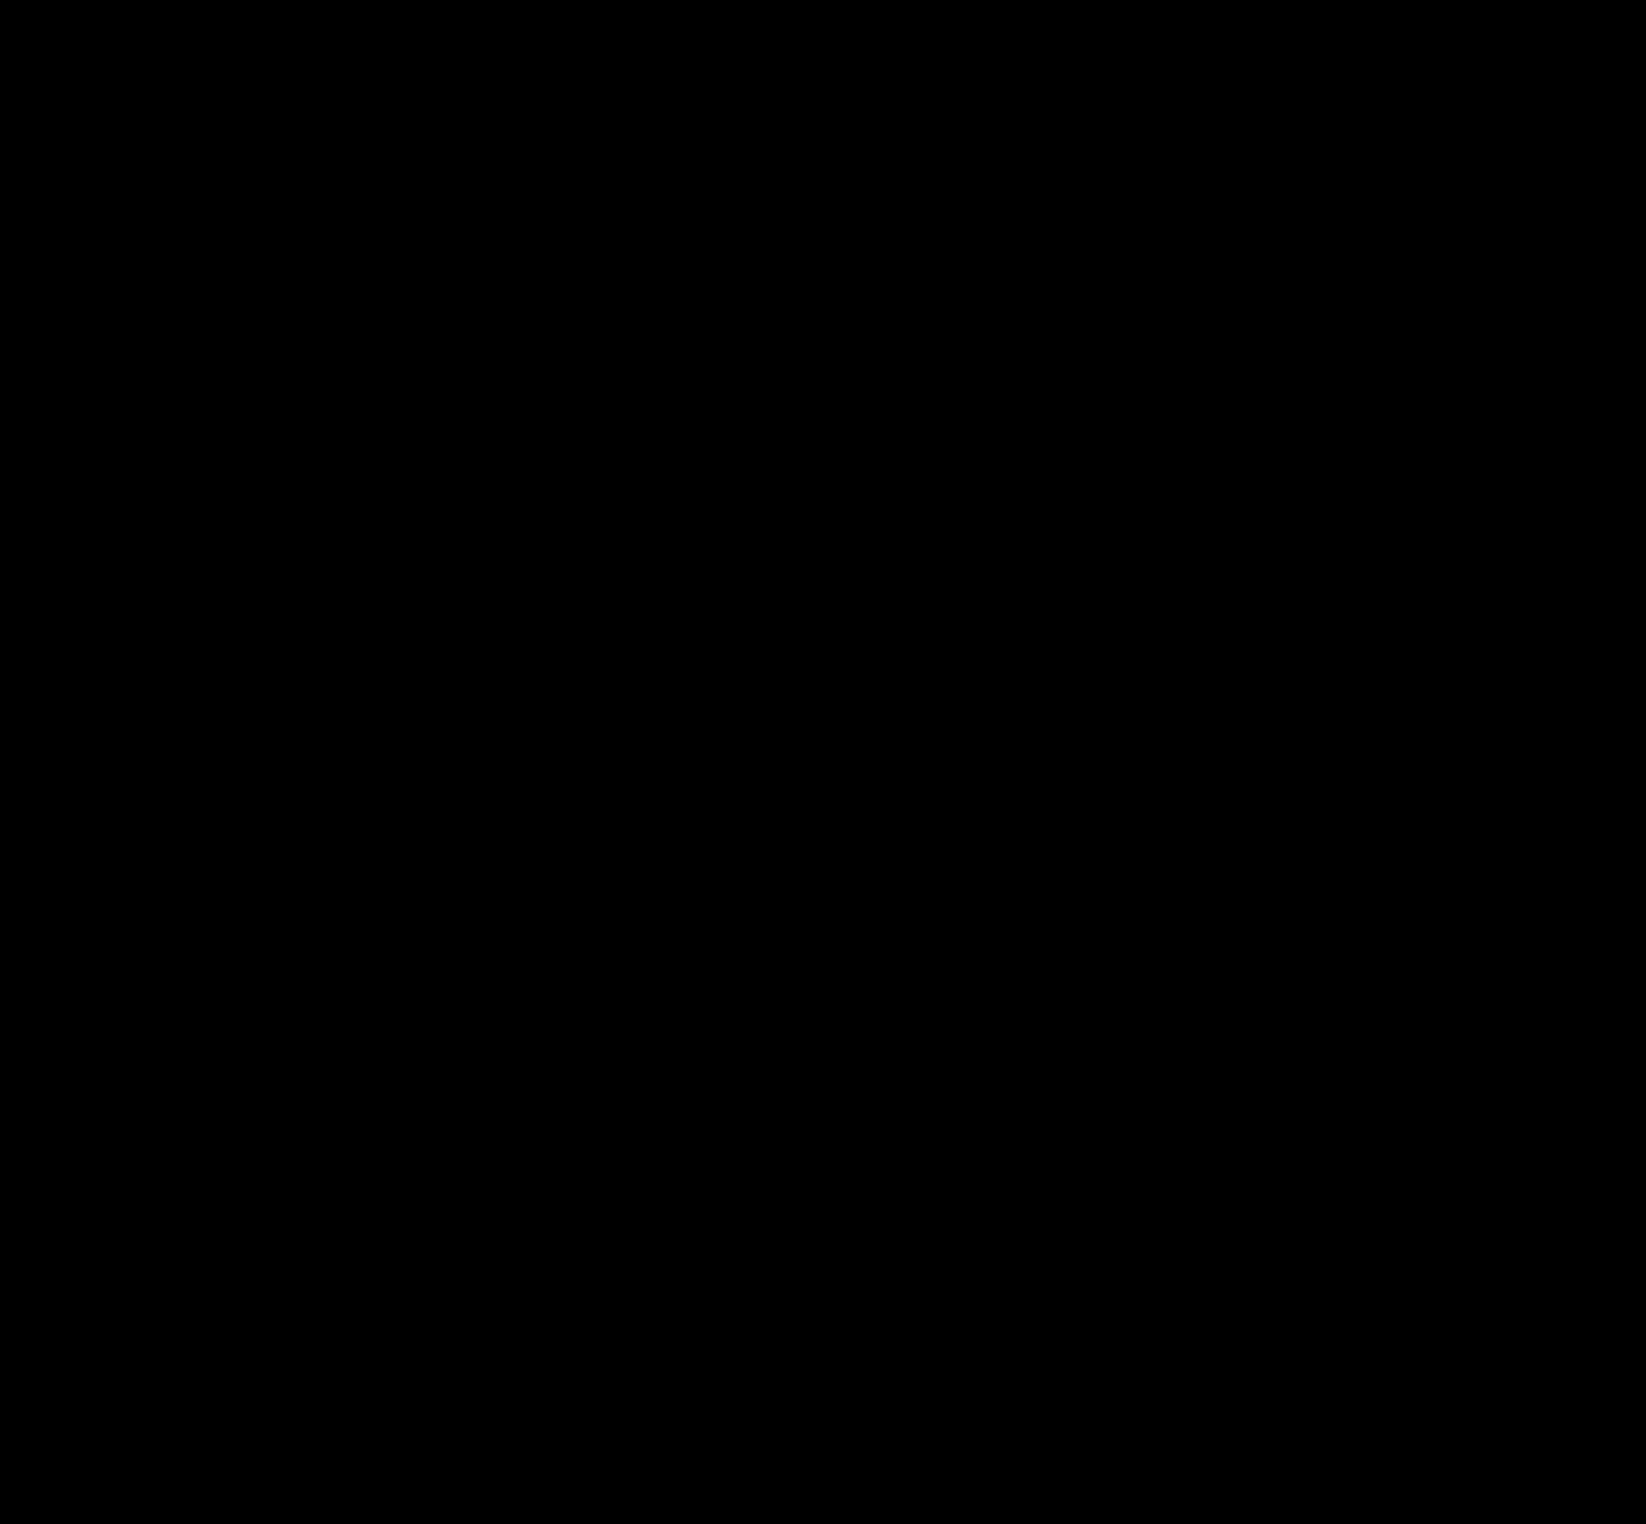 1646x1524 Clipart